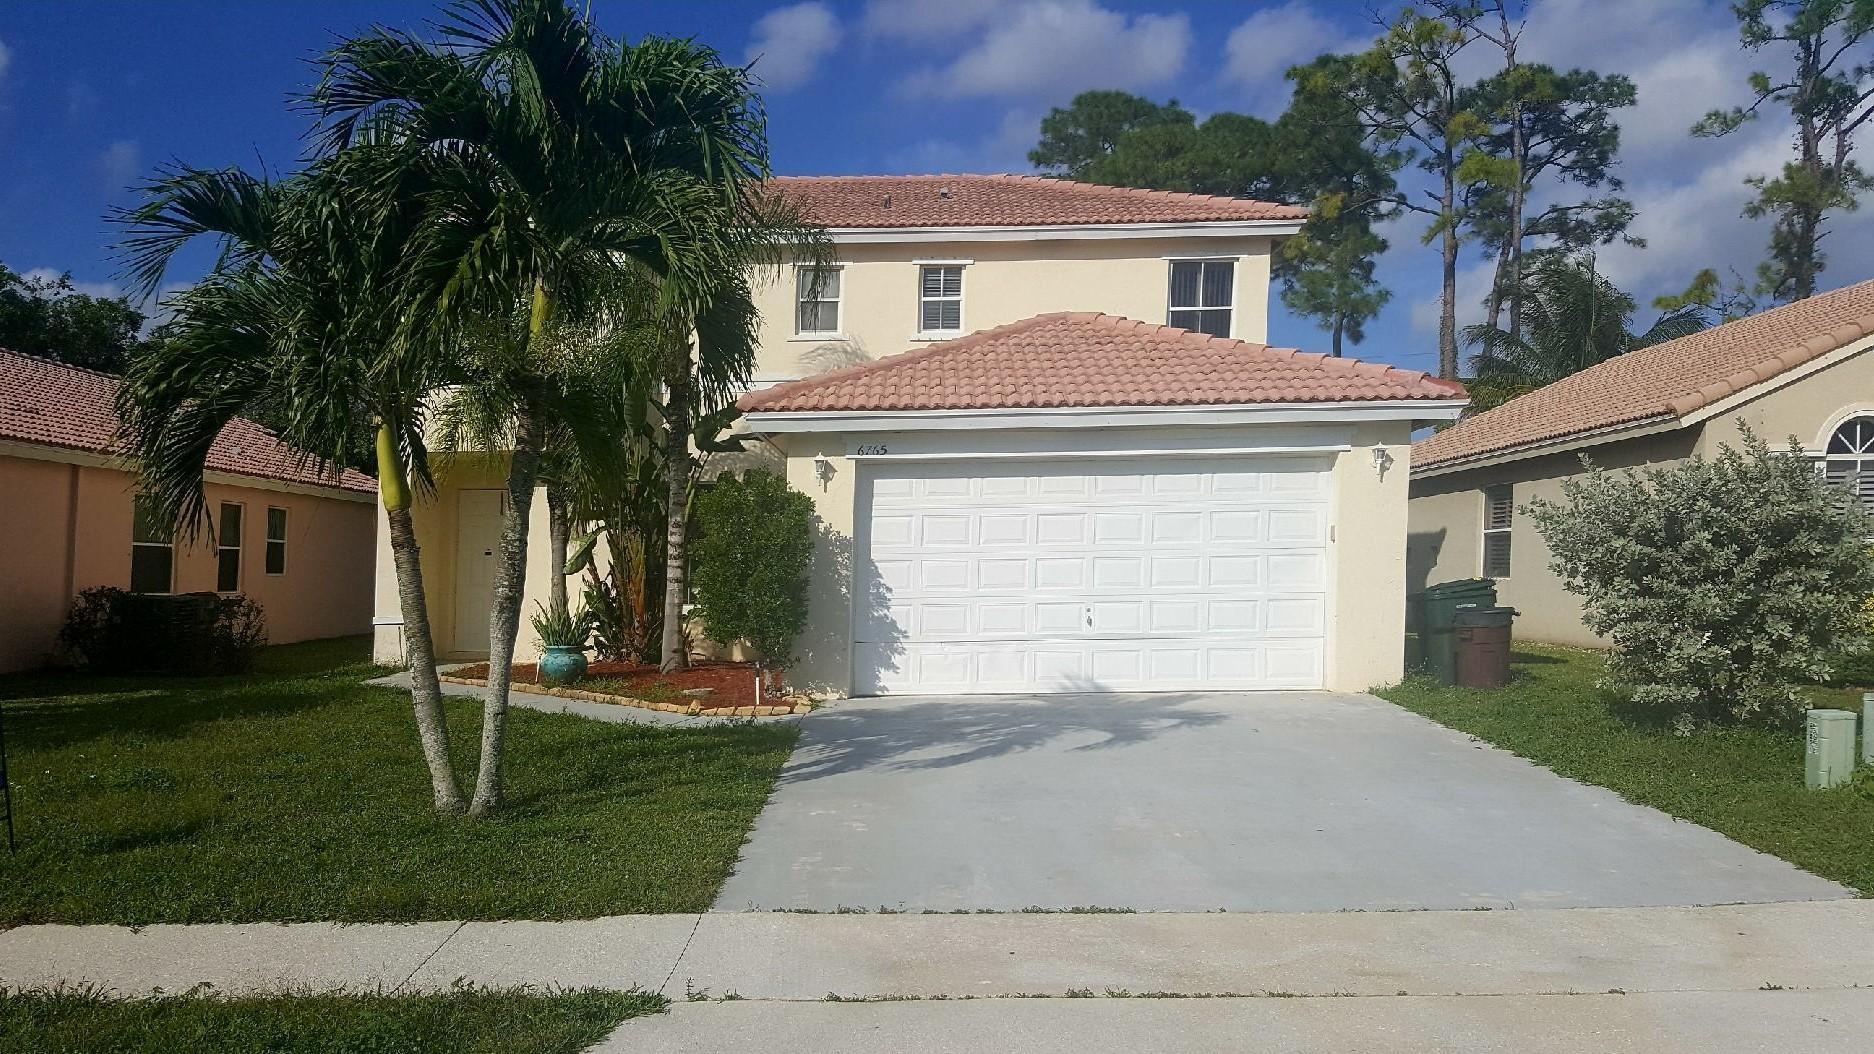 Home for sale in Dillman Farms Greenacres Florida